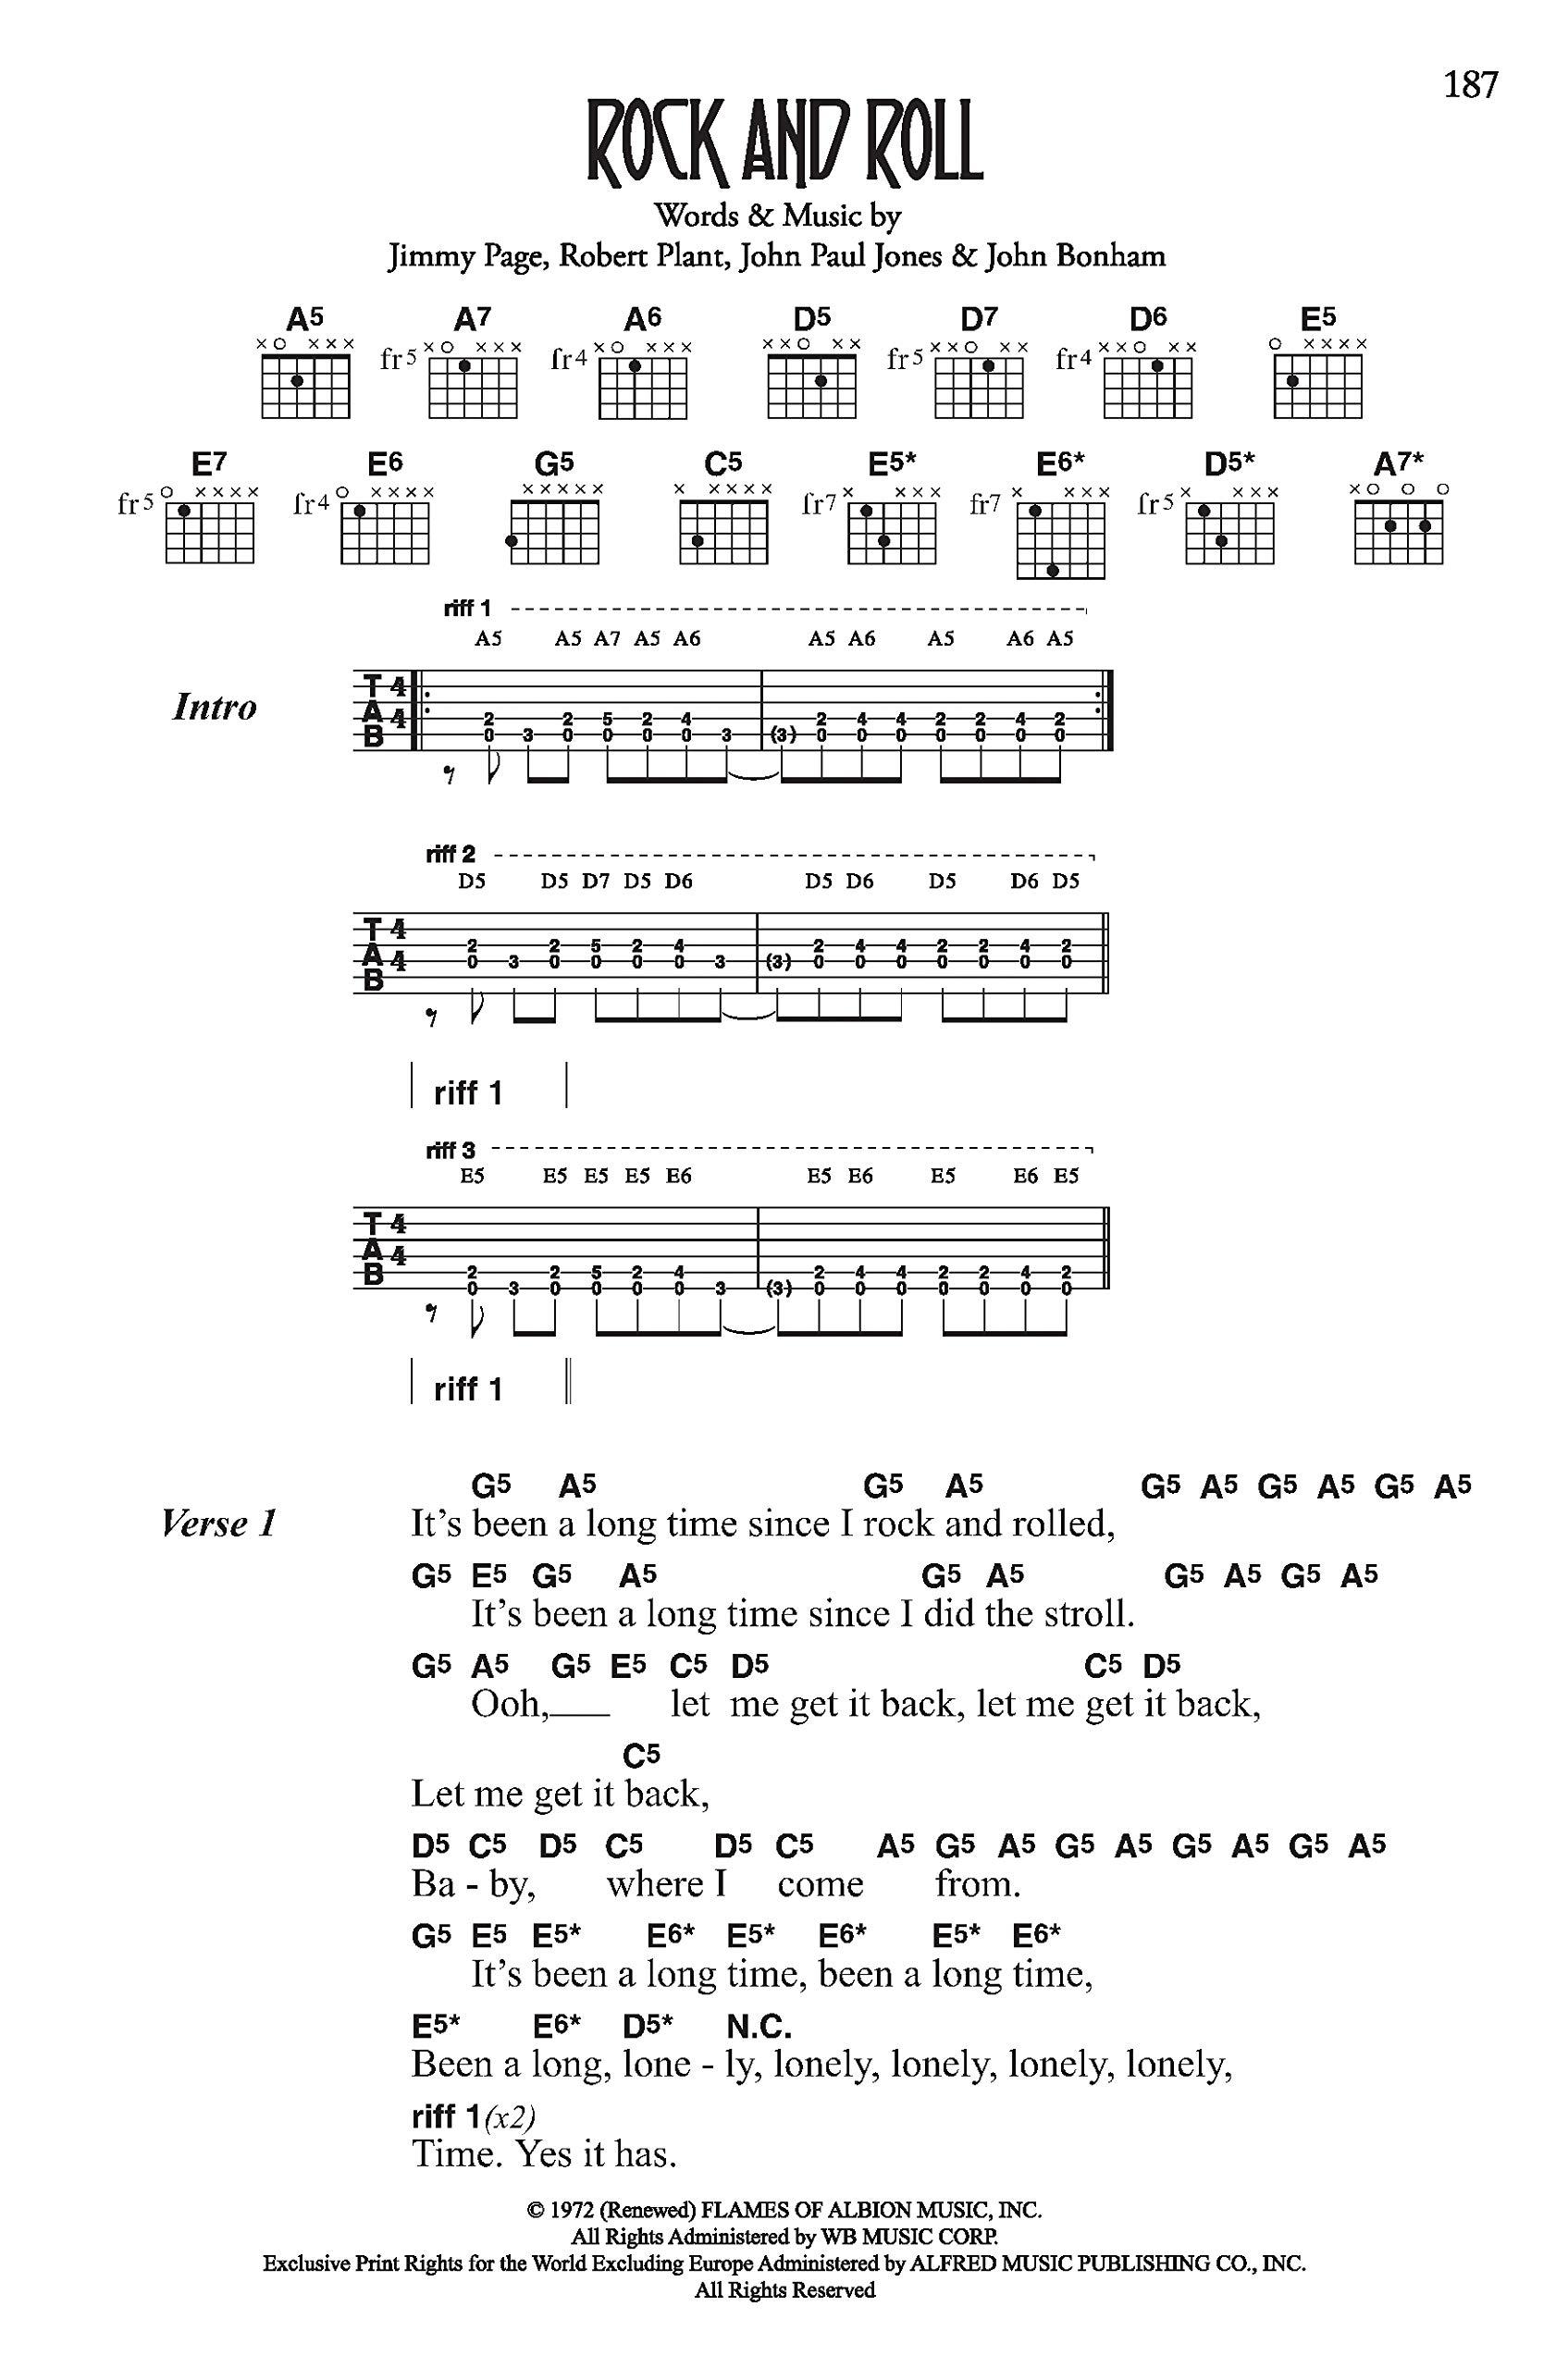 Led Zeppelin: Complete Lyric & Chord Songbook: Amazon.es: Led ...